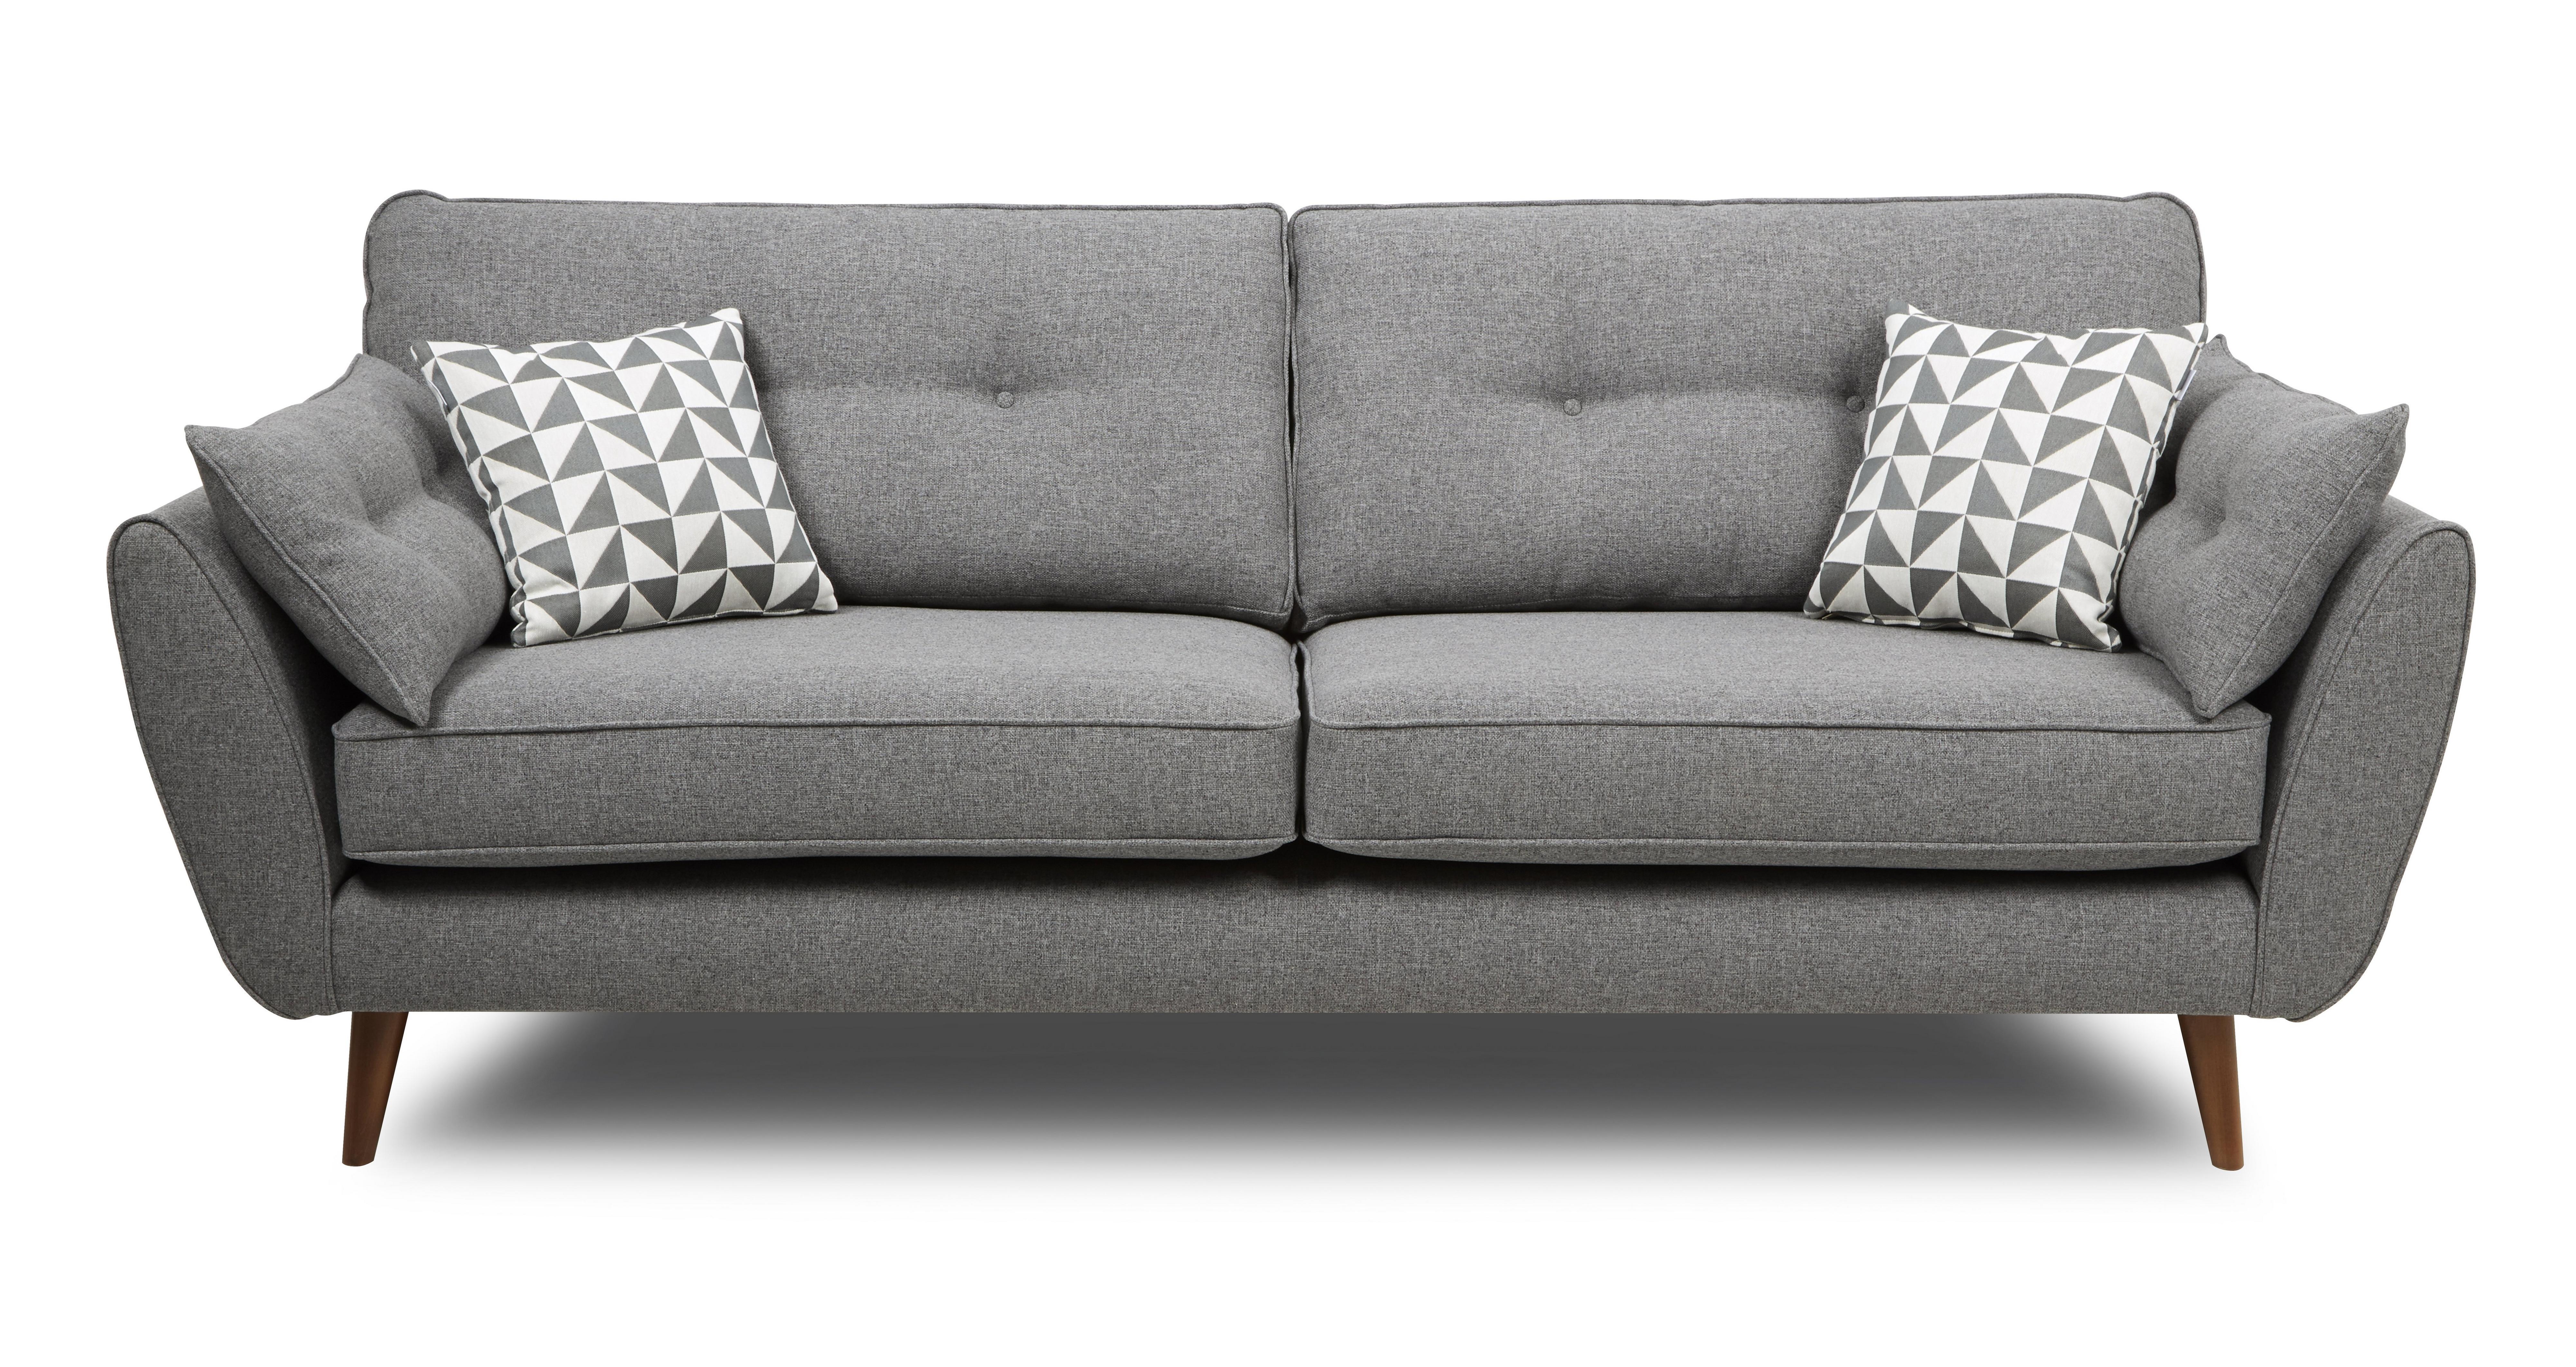 Sofas On Finance No Deposit Uk picture on 4 seater sofa zinc with Sofas On Finance No Deposit Uk, sofa 7b3ab9e2d4fa8d1d199173a29383b61e